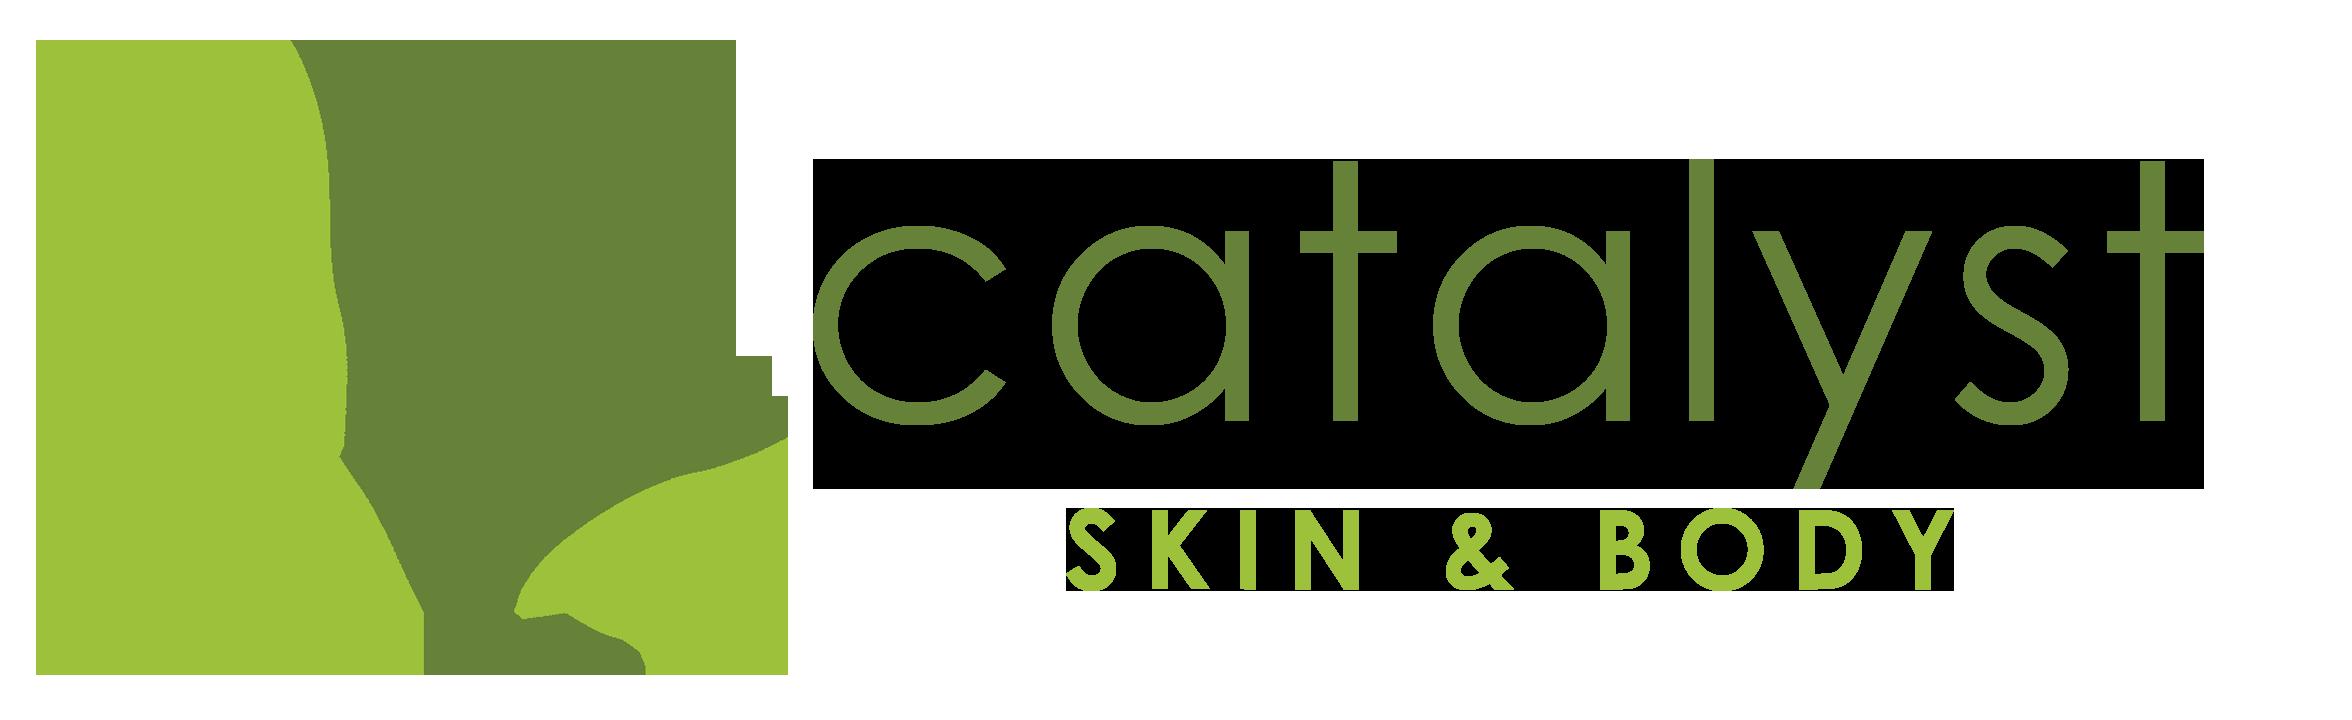 Catalyst Skin & Body